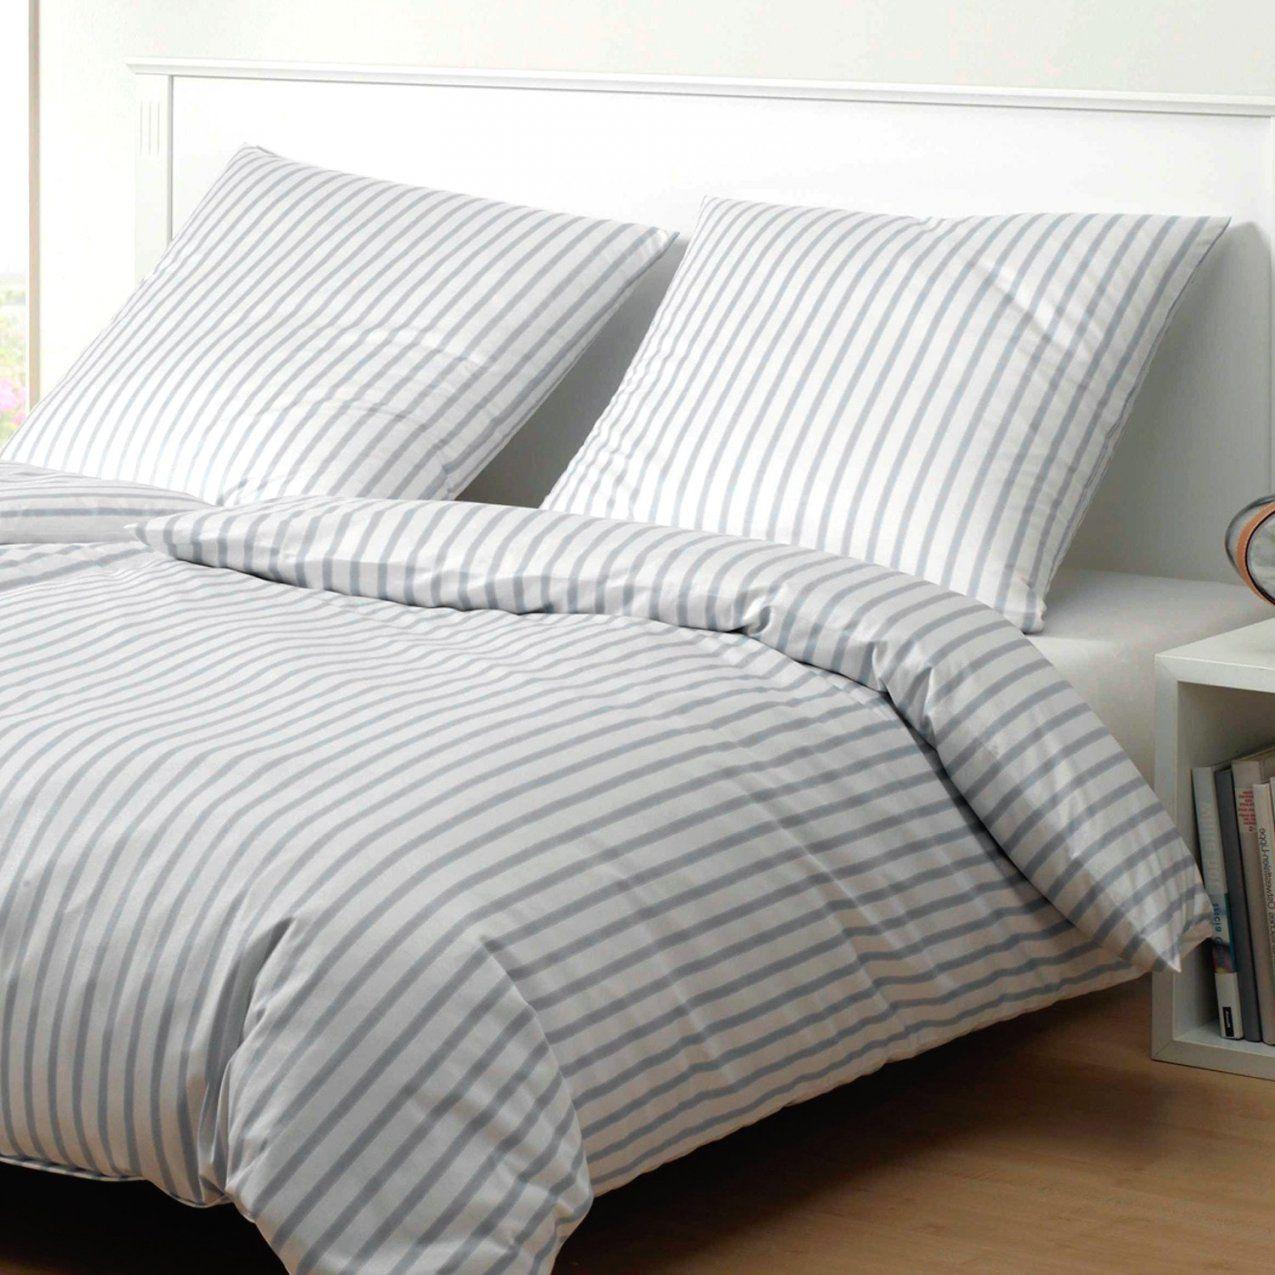 Angenehme Ideen Bettwäsche 155×220 Jersey Reißverschluss Und von Bettwäsche 155X220 Jersey Reißverschluss Photo